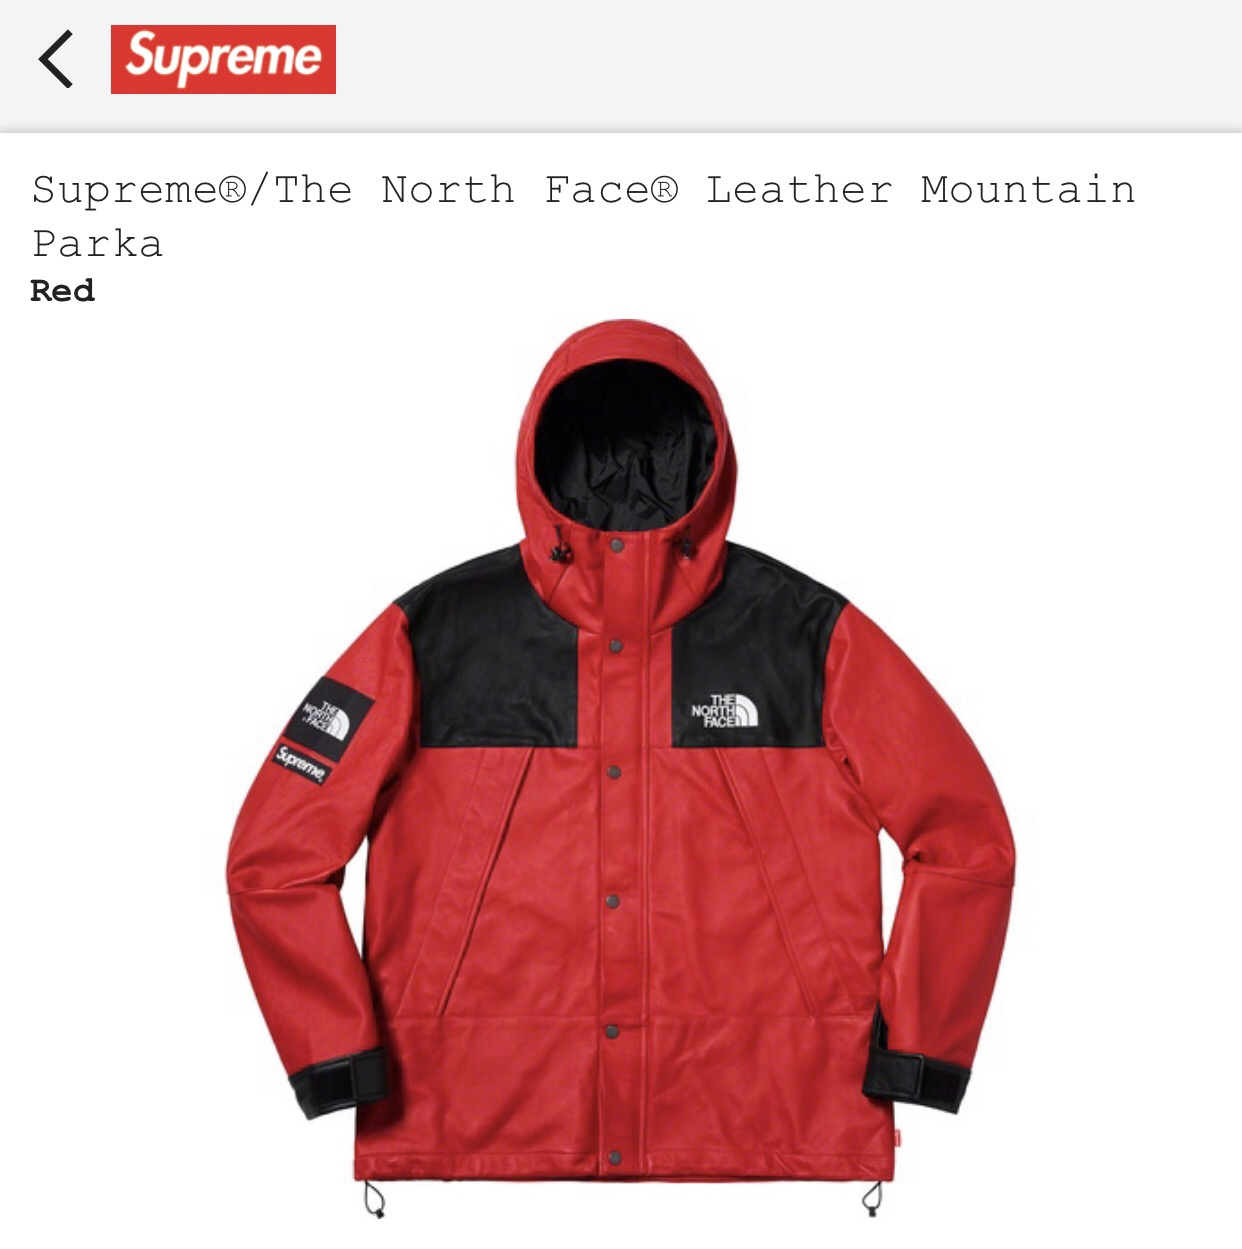 35e2aeb6be7b Supreme Supreme X The North Face Mountain Leather Parka (red) | Grailed